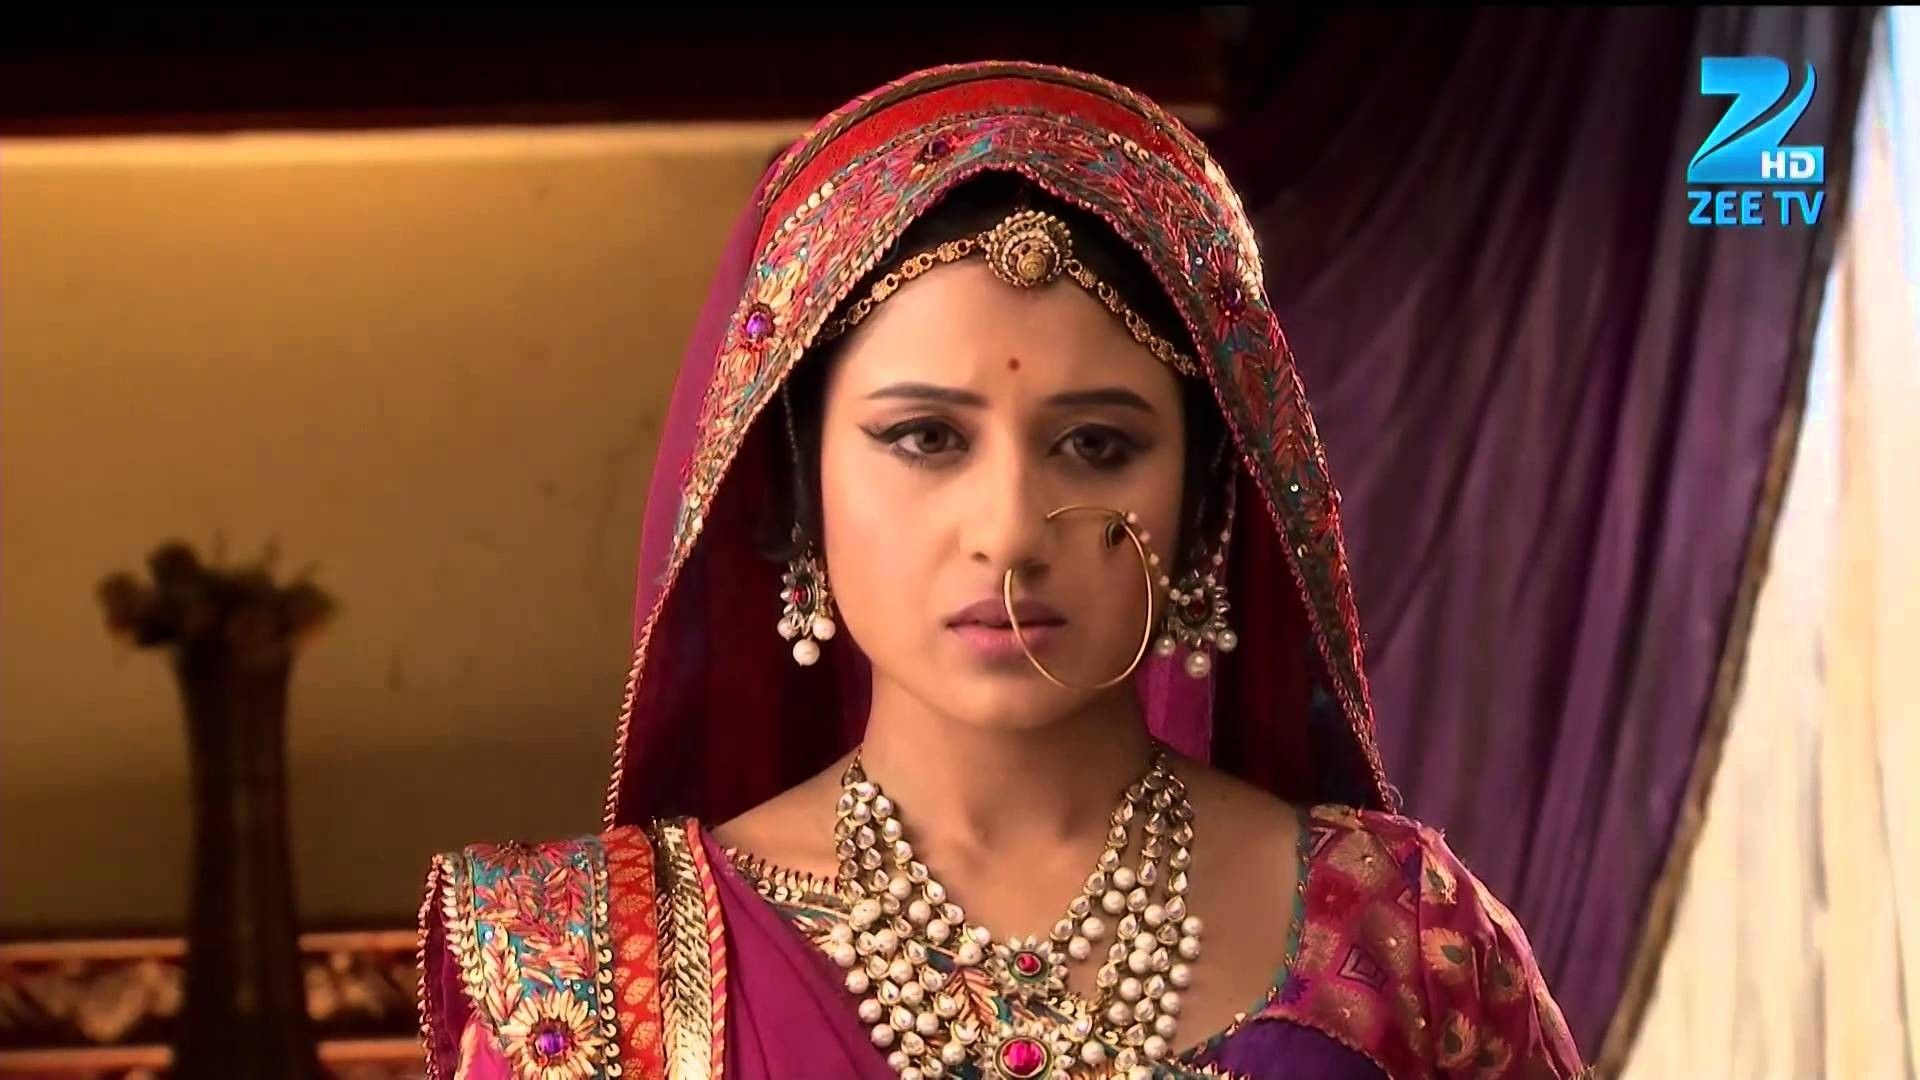 Zee Tv Jodha Akbar Paridhi Sharma Jodha Latest Pics Photos Jodha Akbar Jodhaa Akbar Indian Bride Outfits